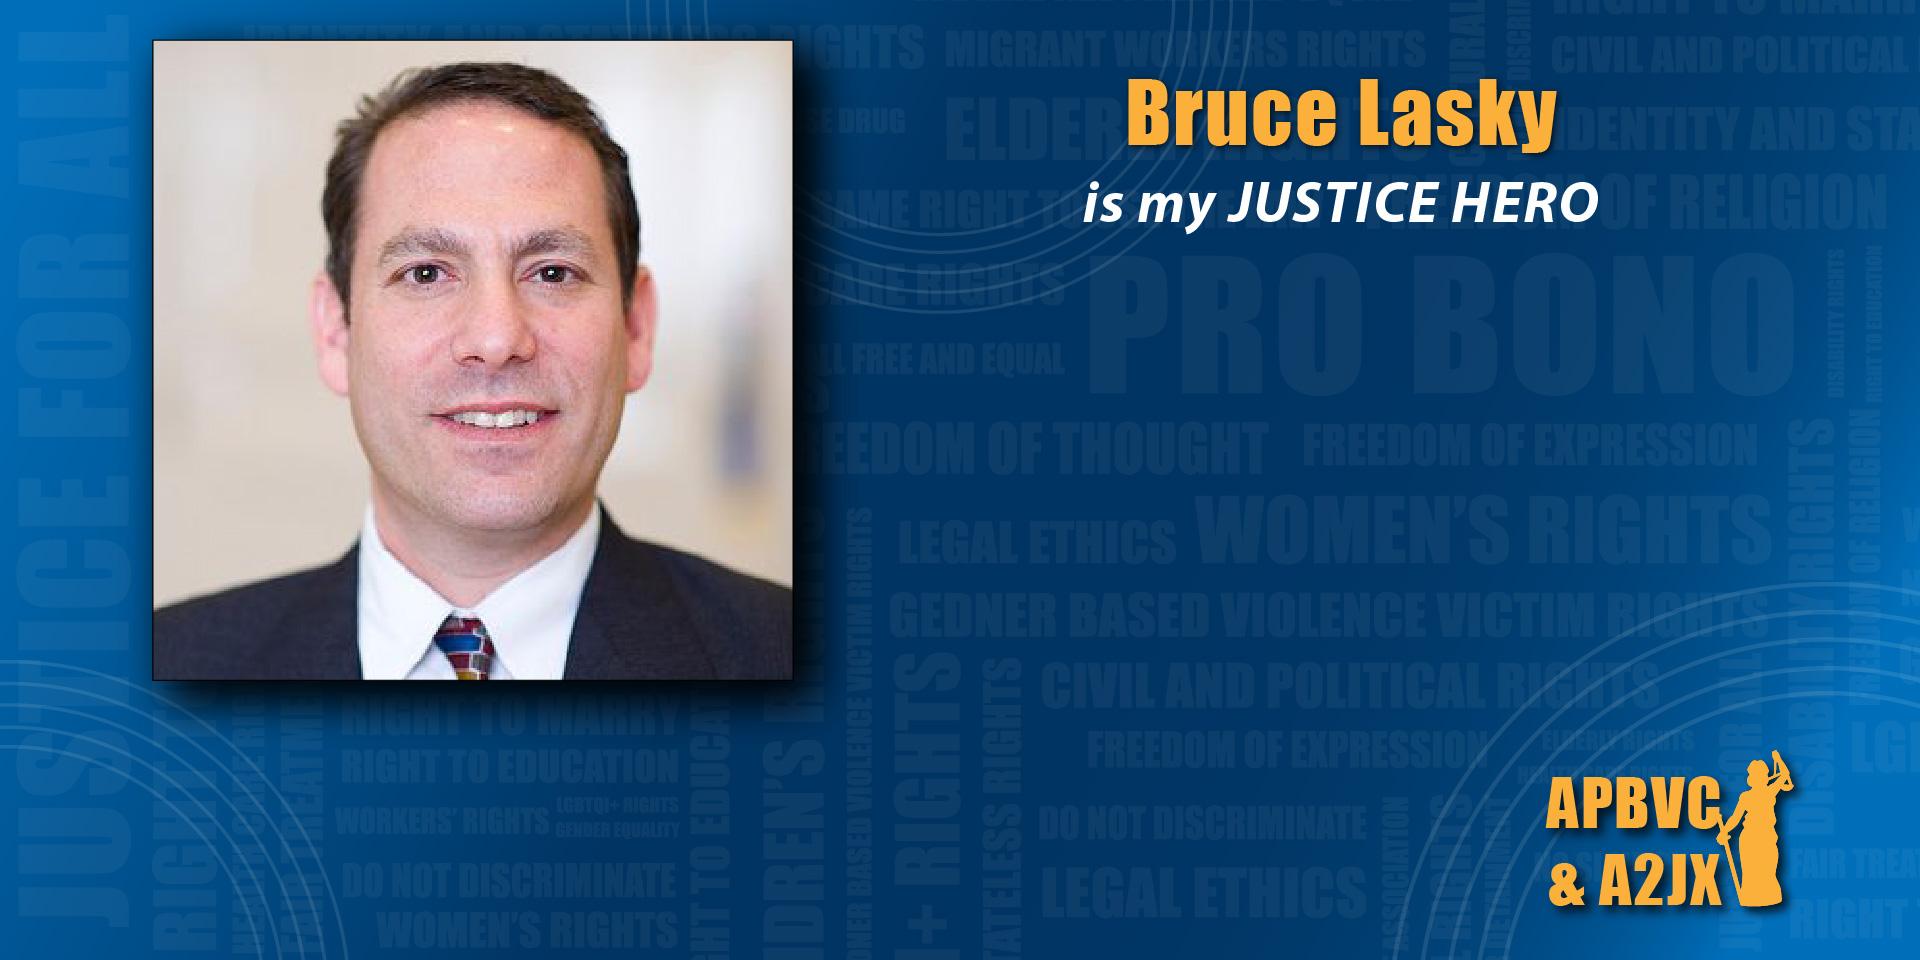 Bruce Lasky